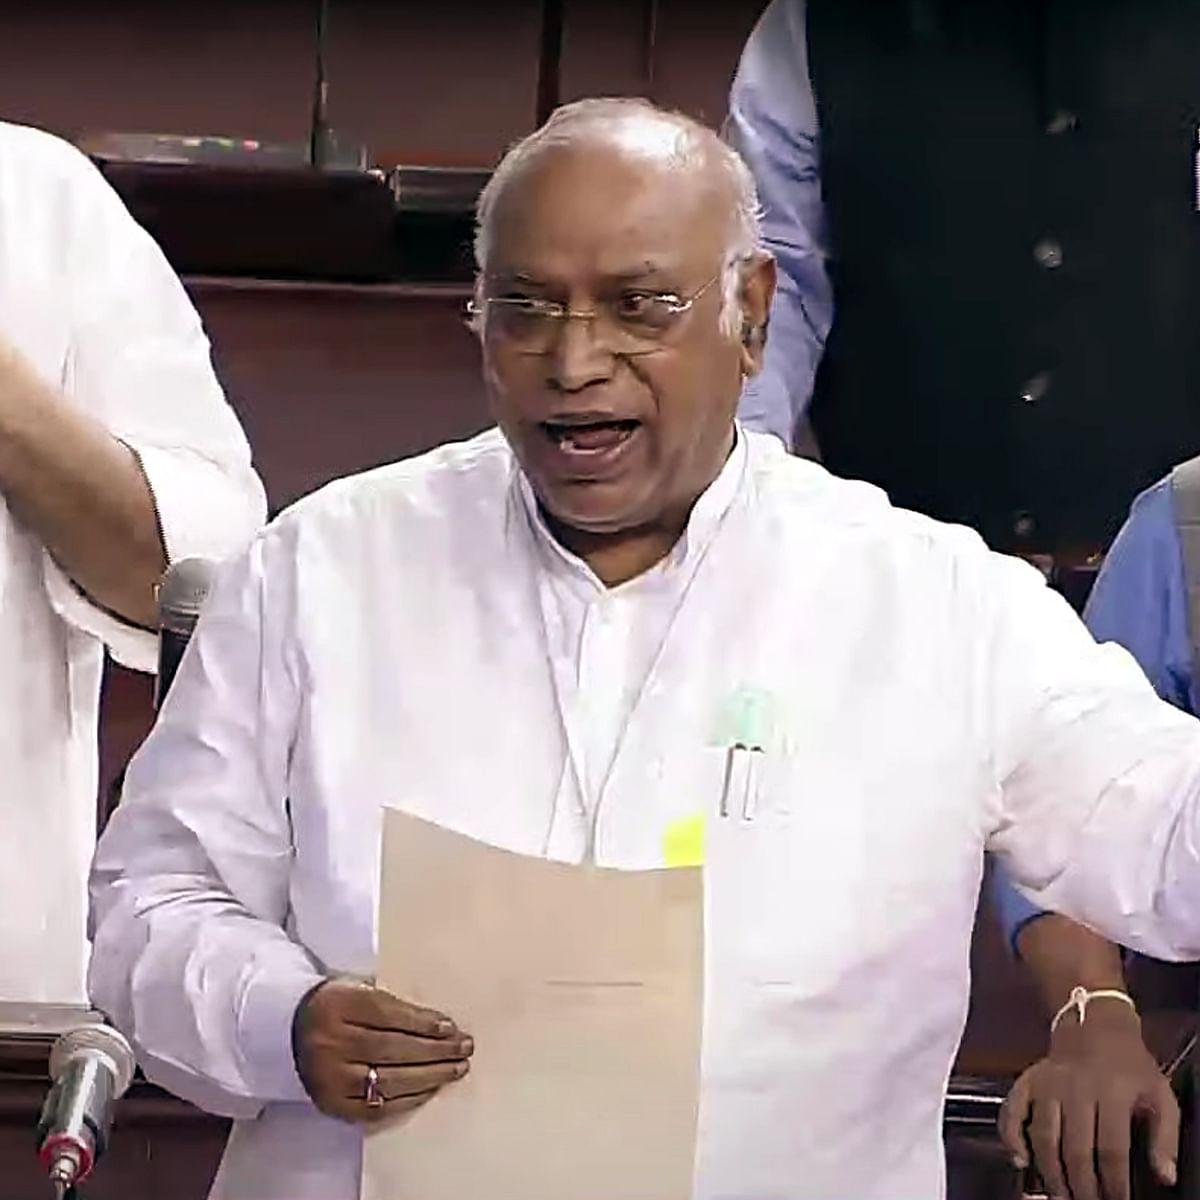 Govt's Covid death toll figures 'false' and conservative: Mallikarjuna Kharge in Rajya Sabha